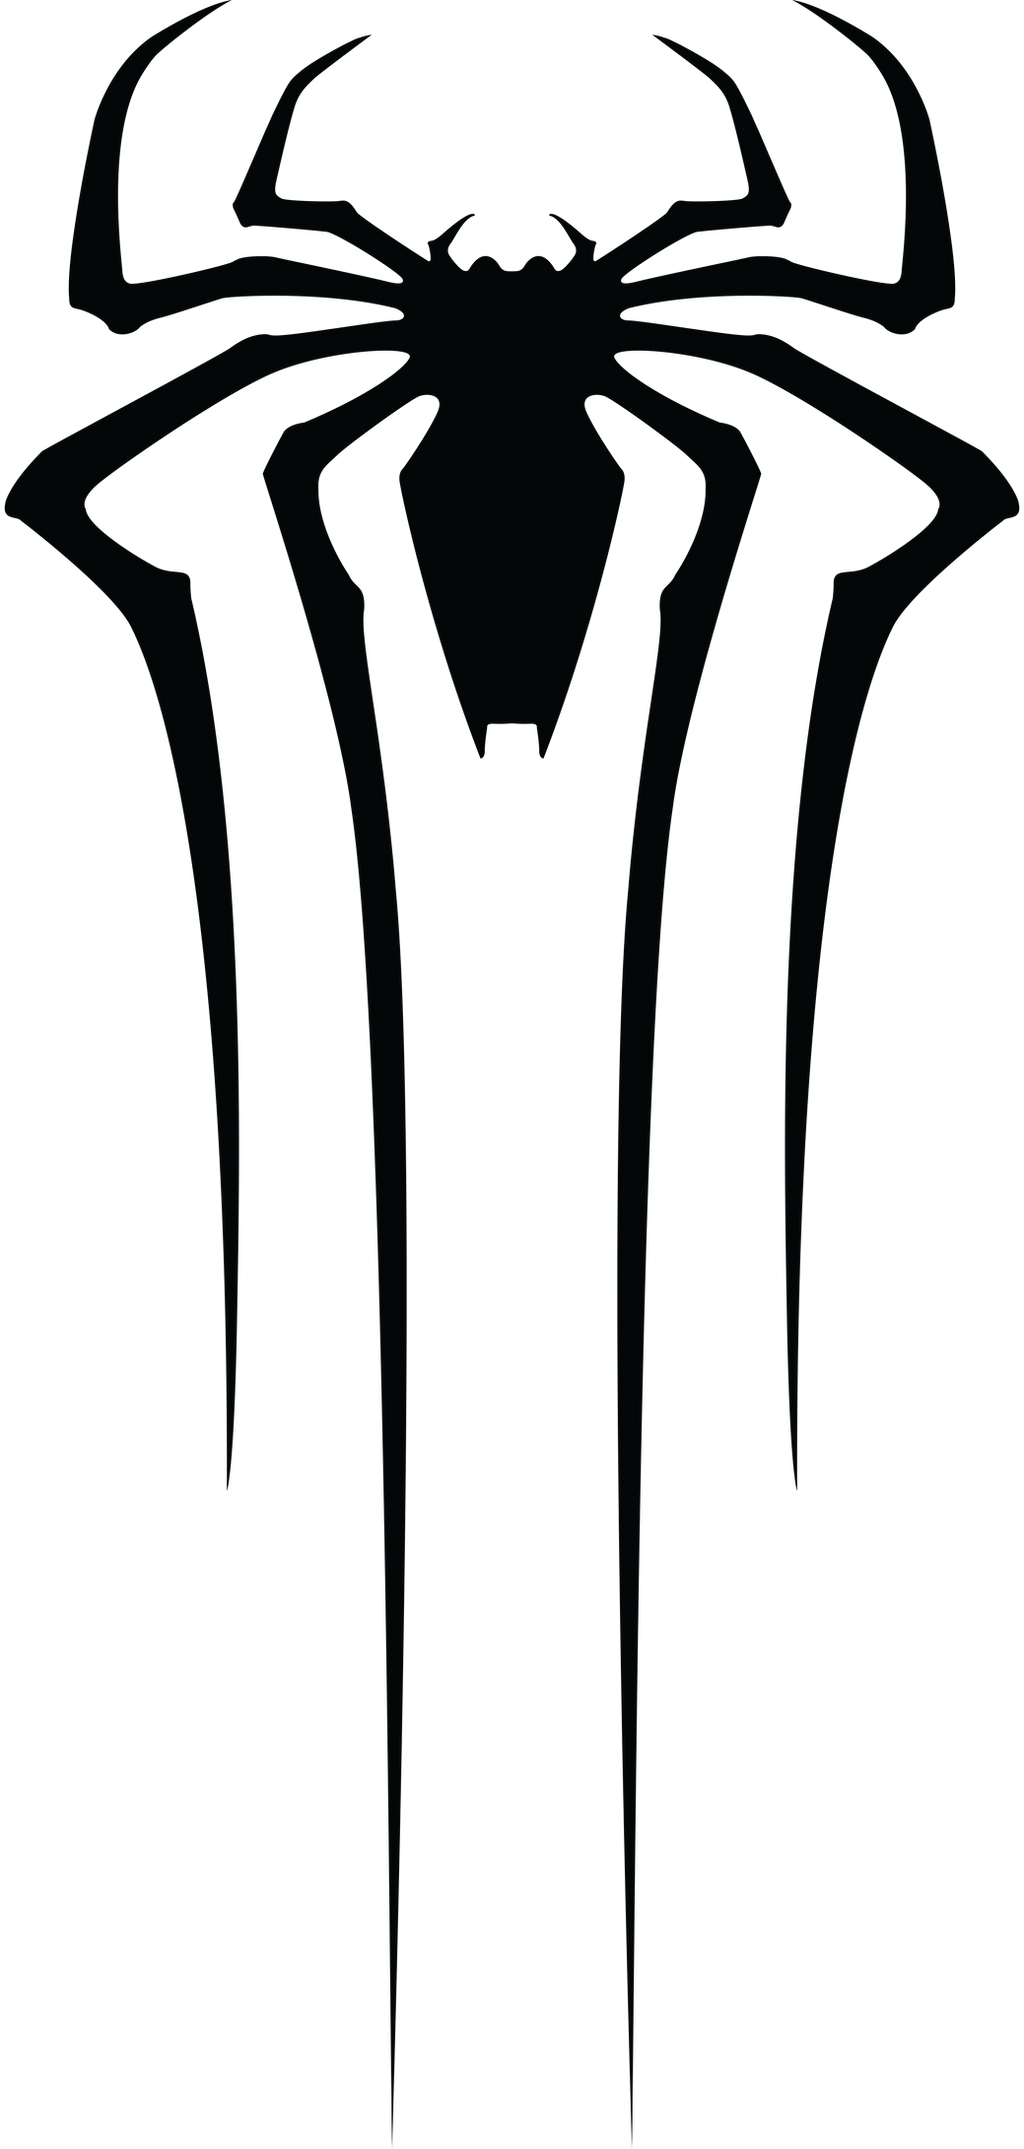 http://img12.deviantart.net/4219/i/2013/203/6/c/new_amazing_spiderman_logo_by_navdbest-d6ekn58.png